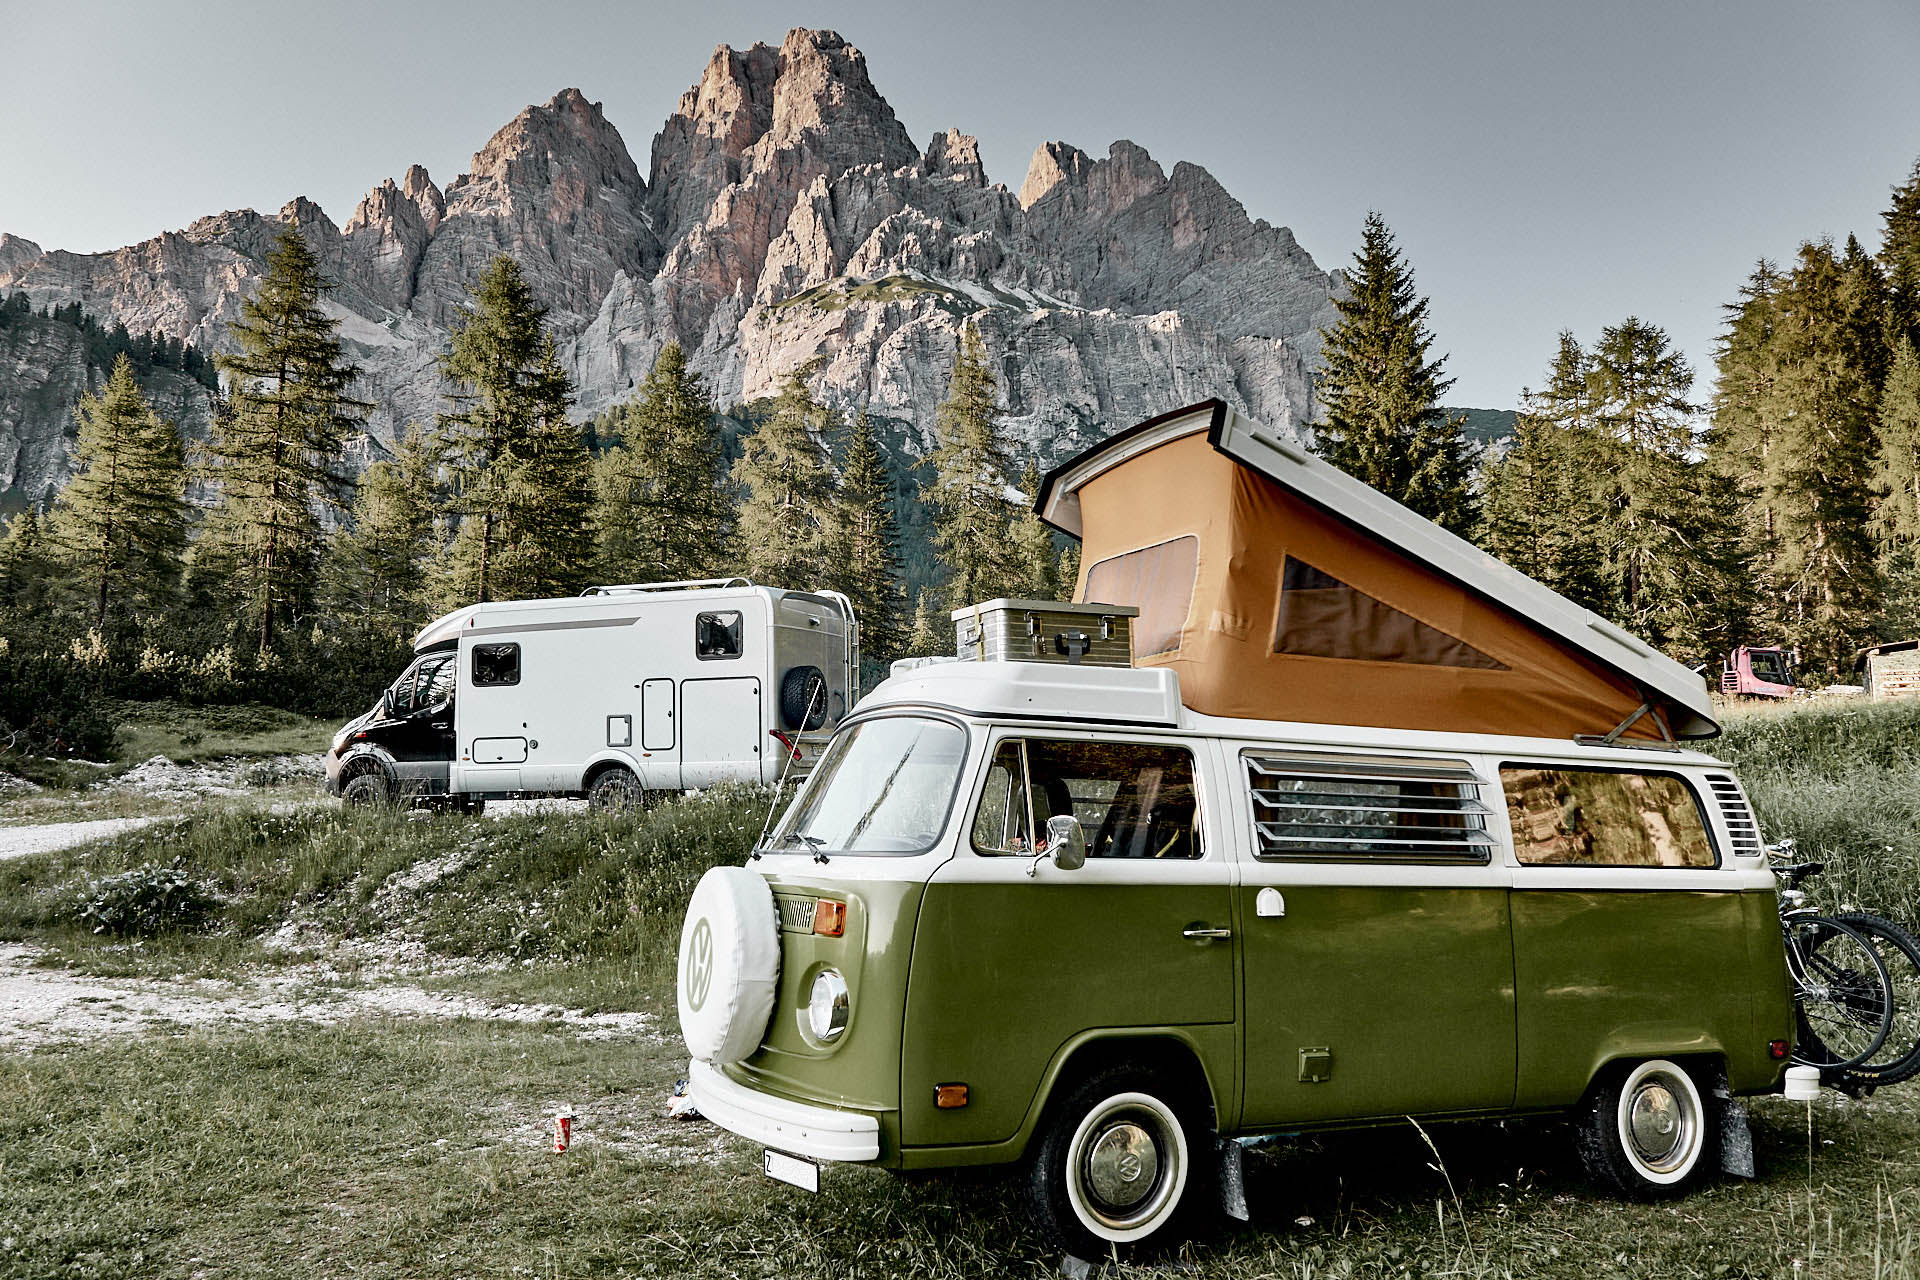 9 Alpenpässe mit dem Wohnmobil, Bulli, Hymer MLT, Monte Cristallo